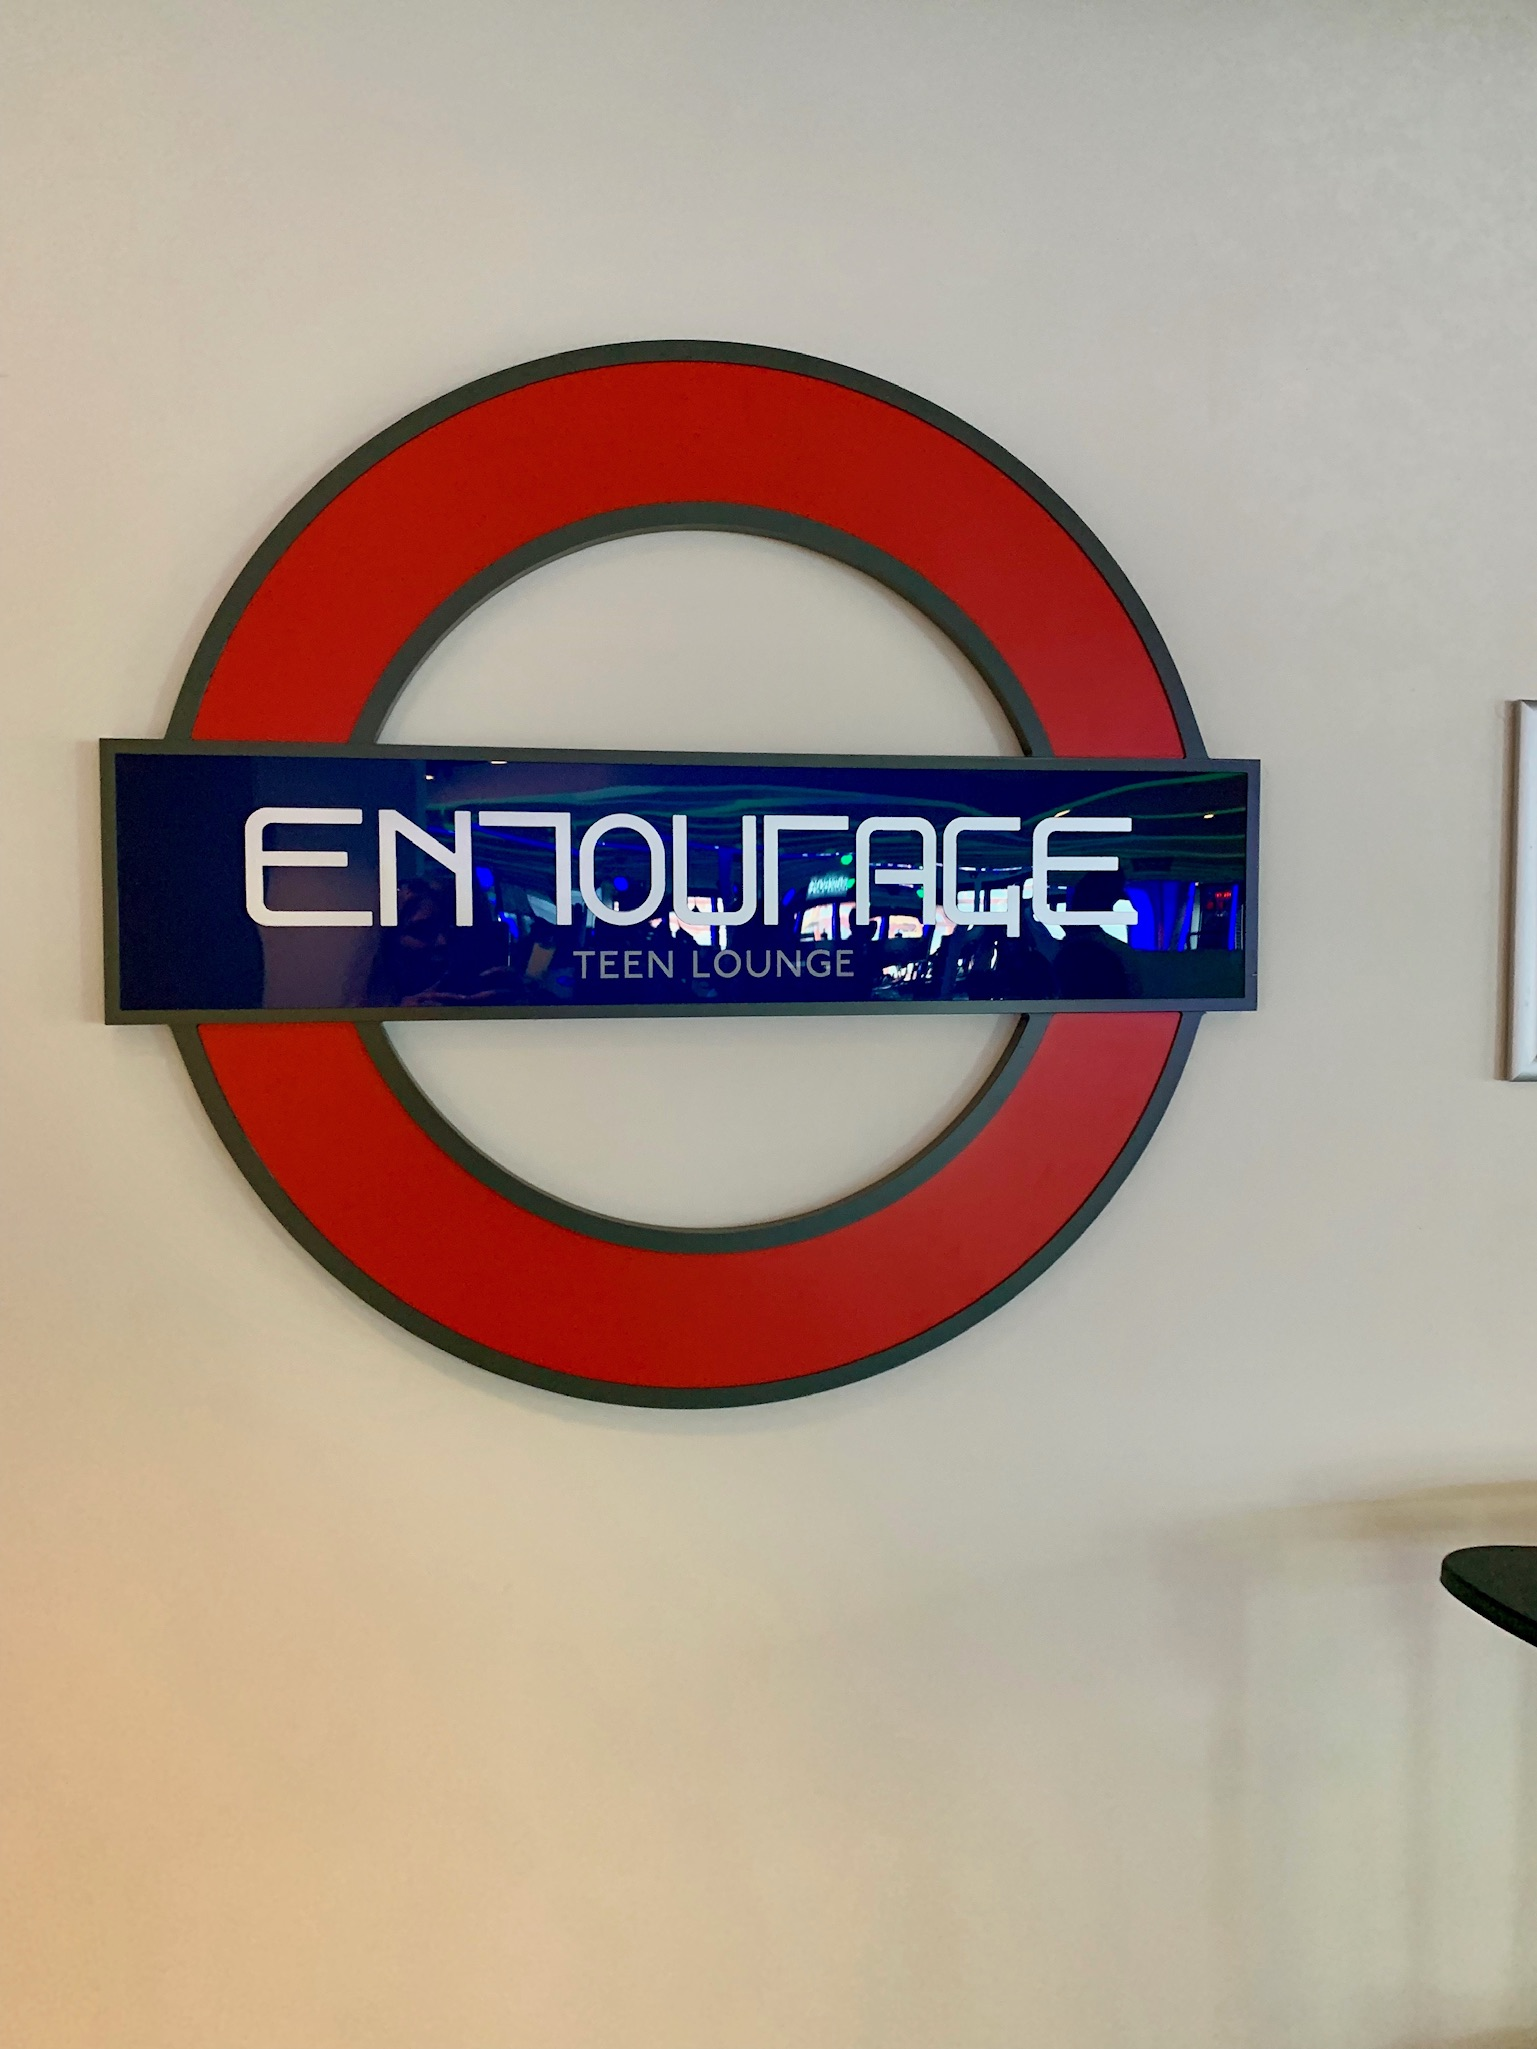 NCL Joy - Entourage Sign.jpg